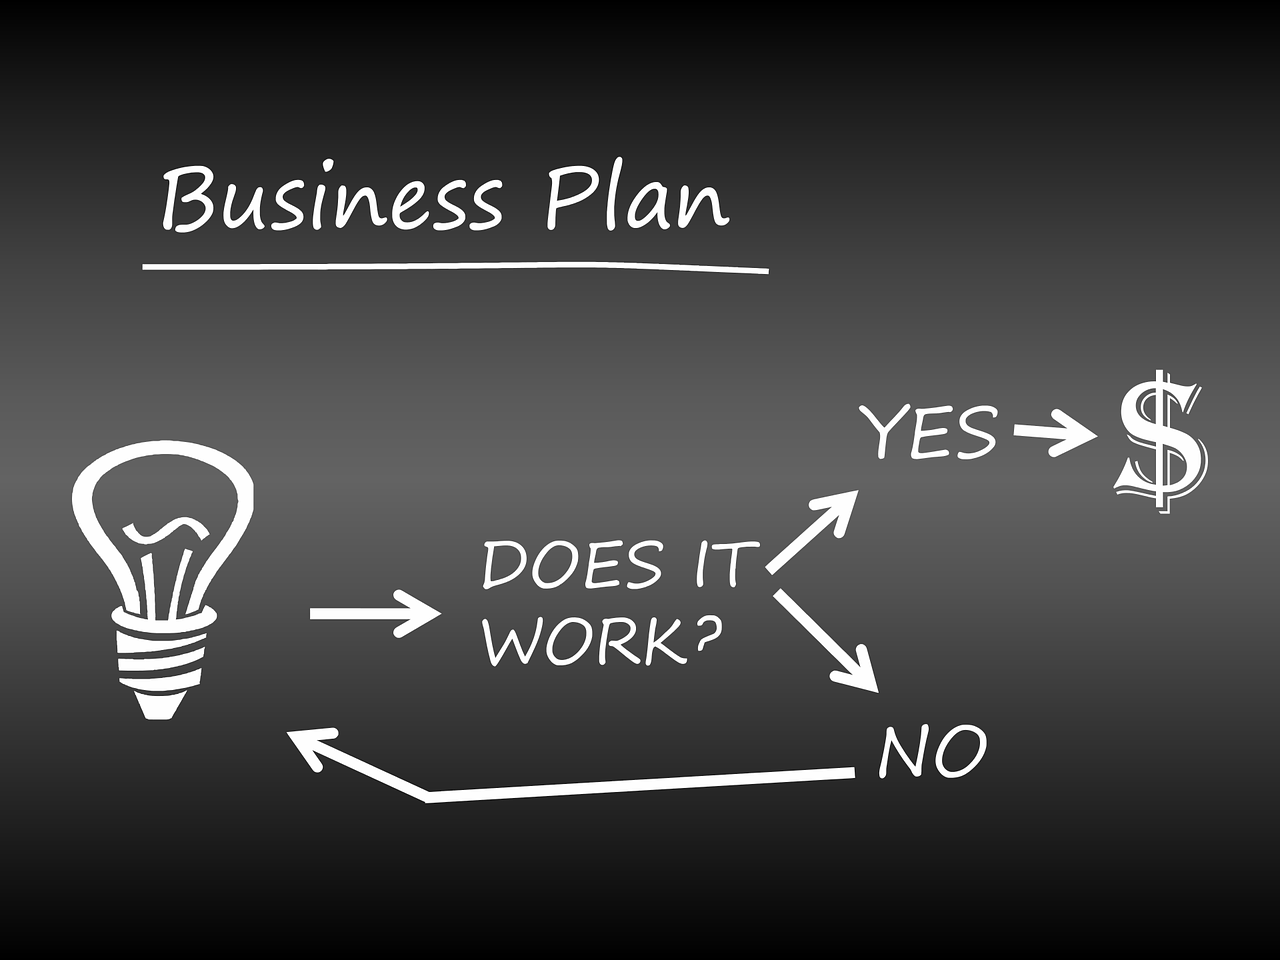 MVNO business model